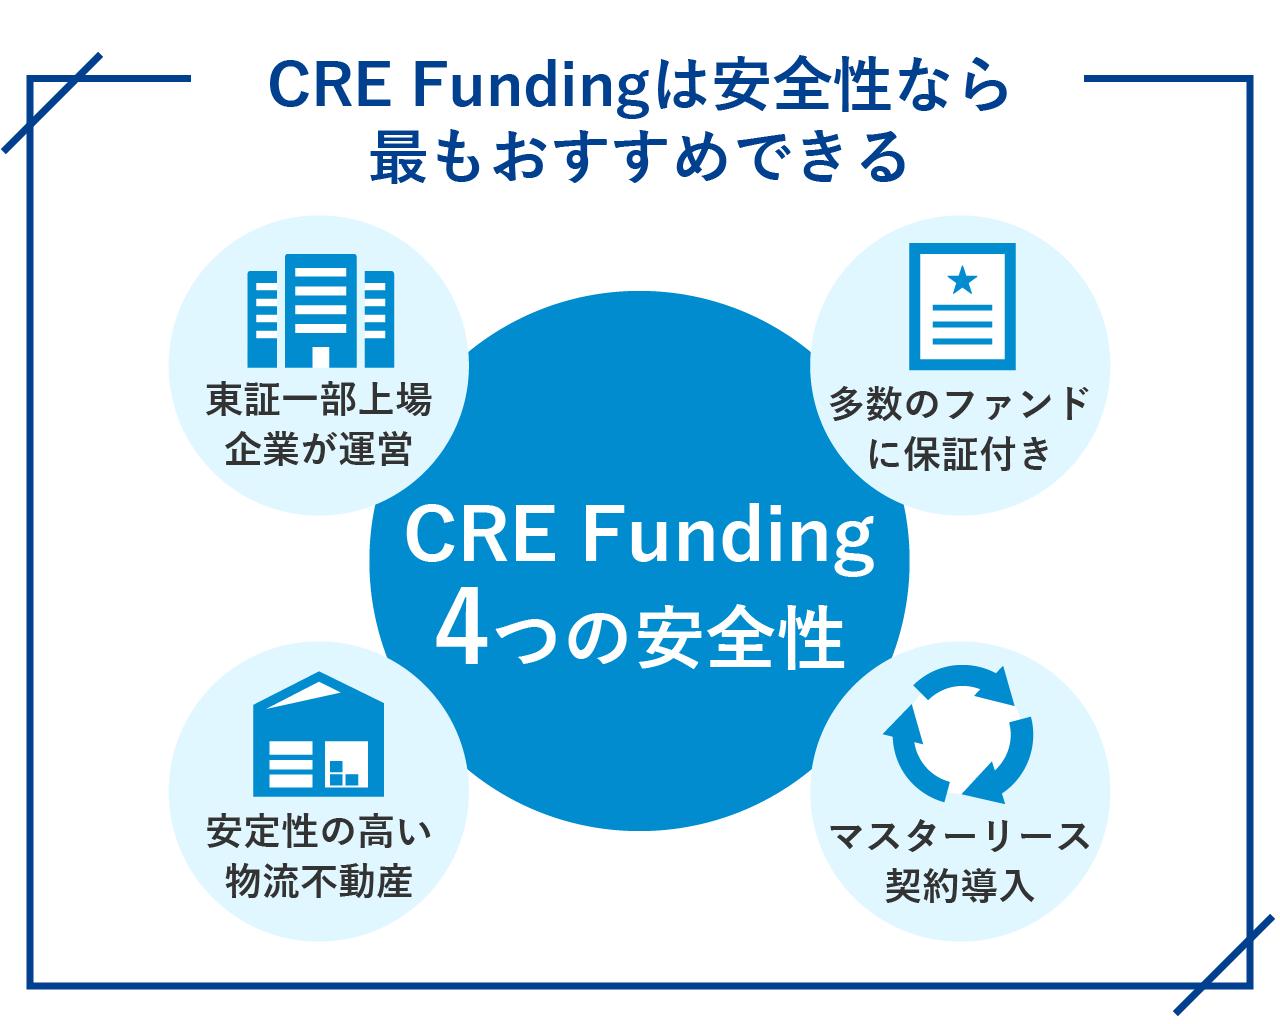 36_CRE-Fundingは安全性なら最もおすすめできる